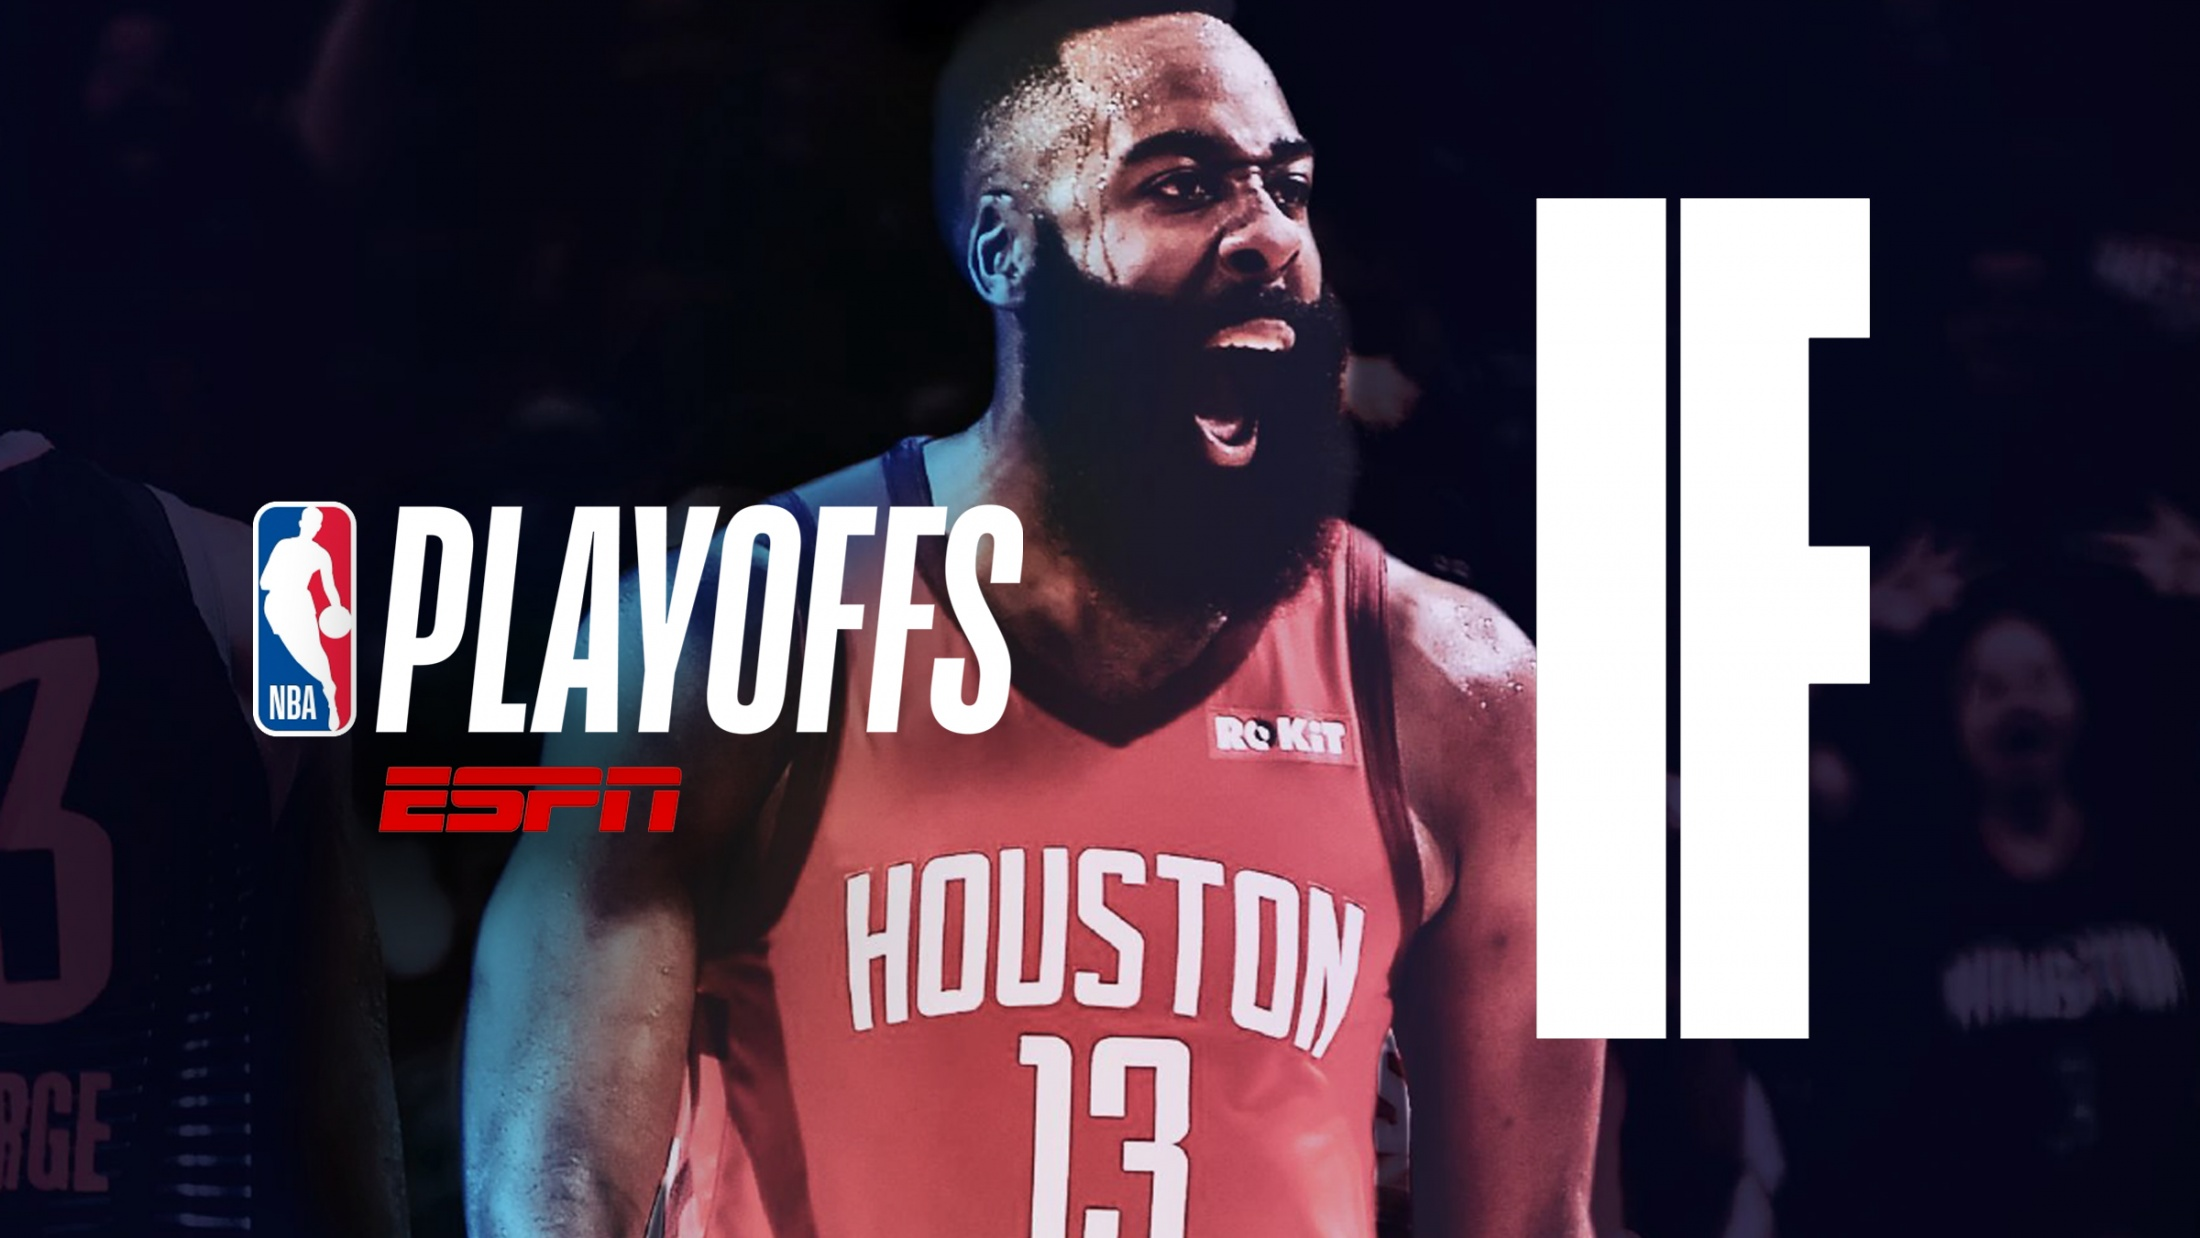 Thumbnail for NBA